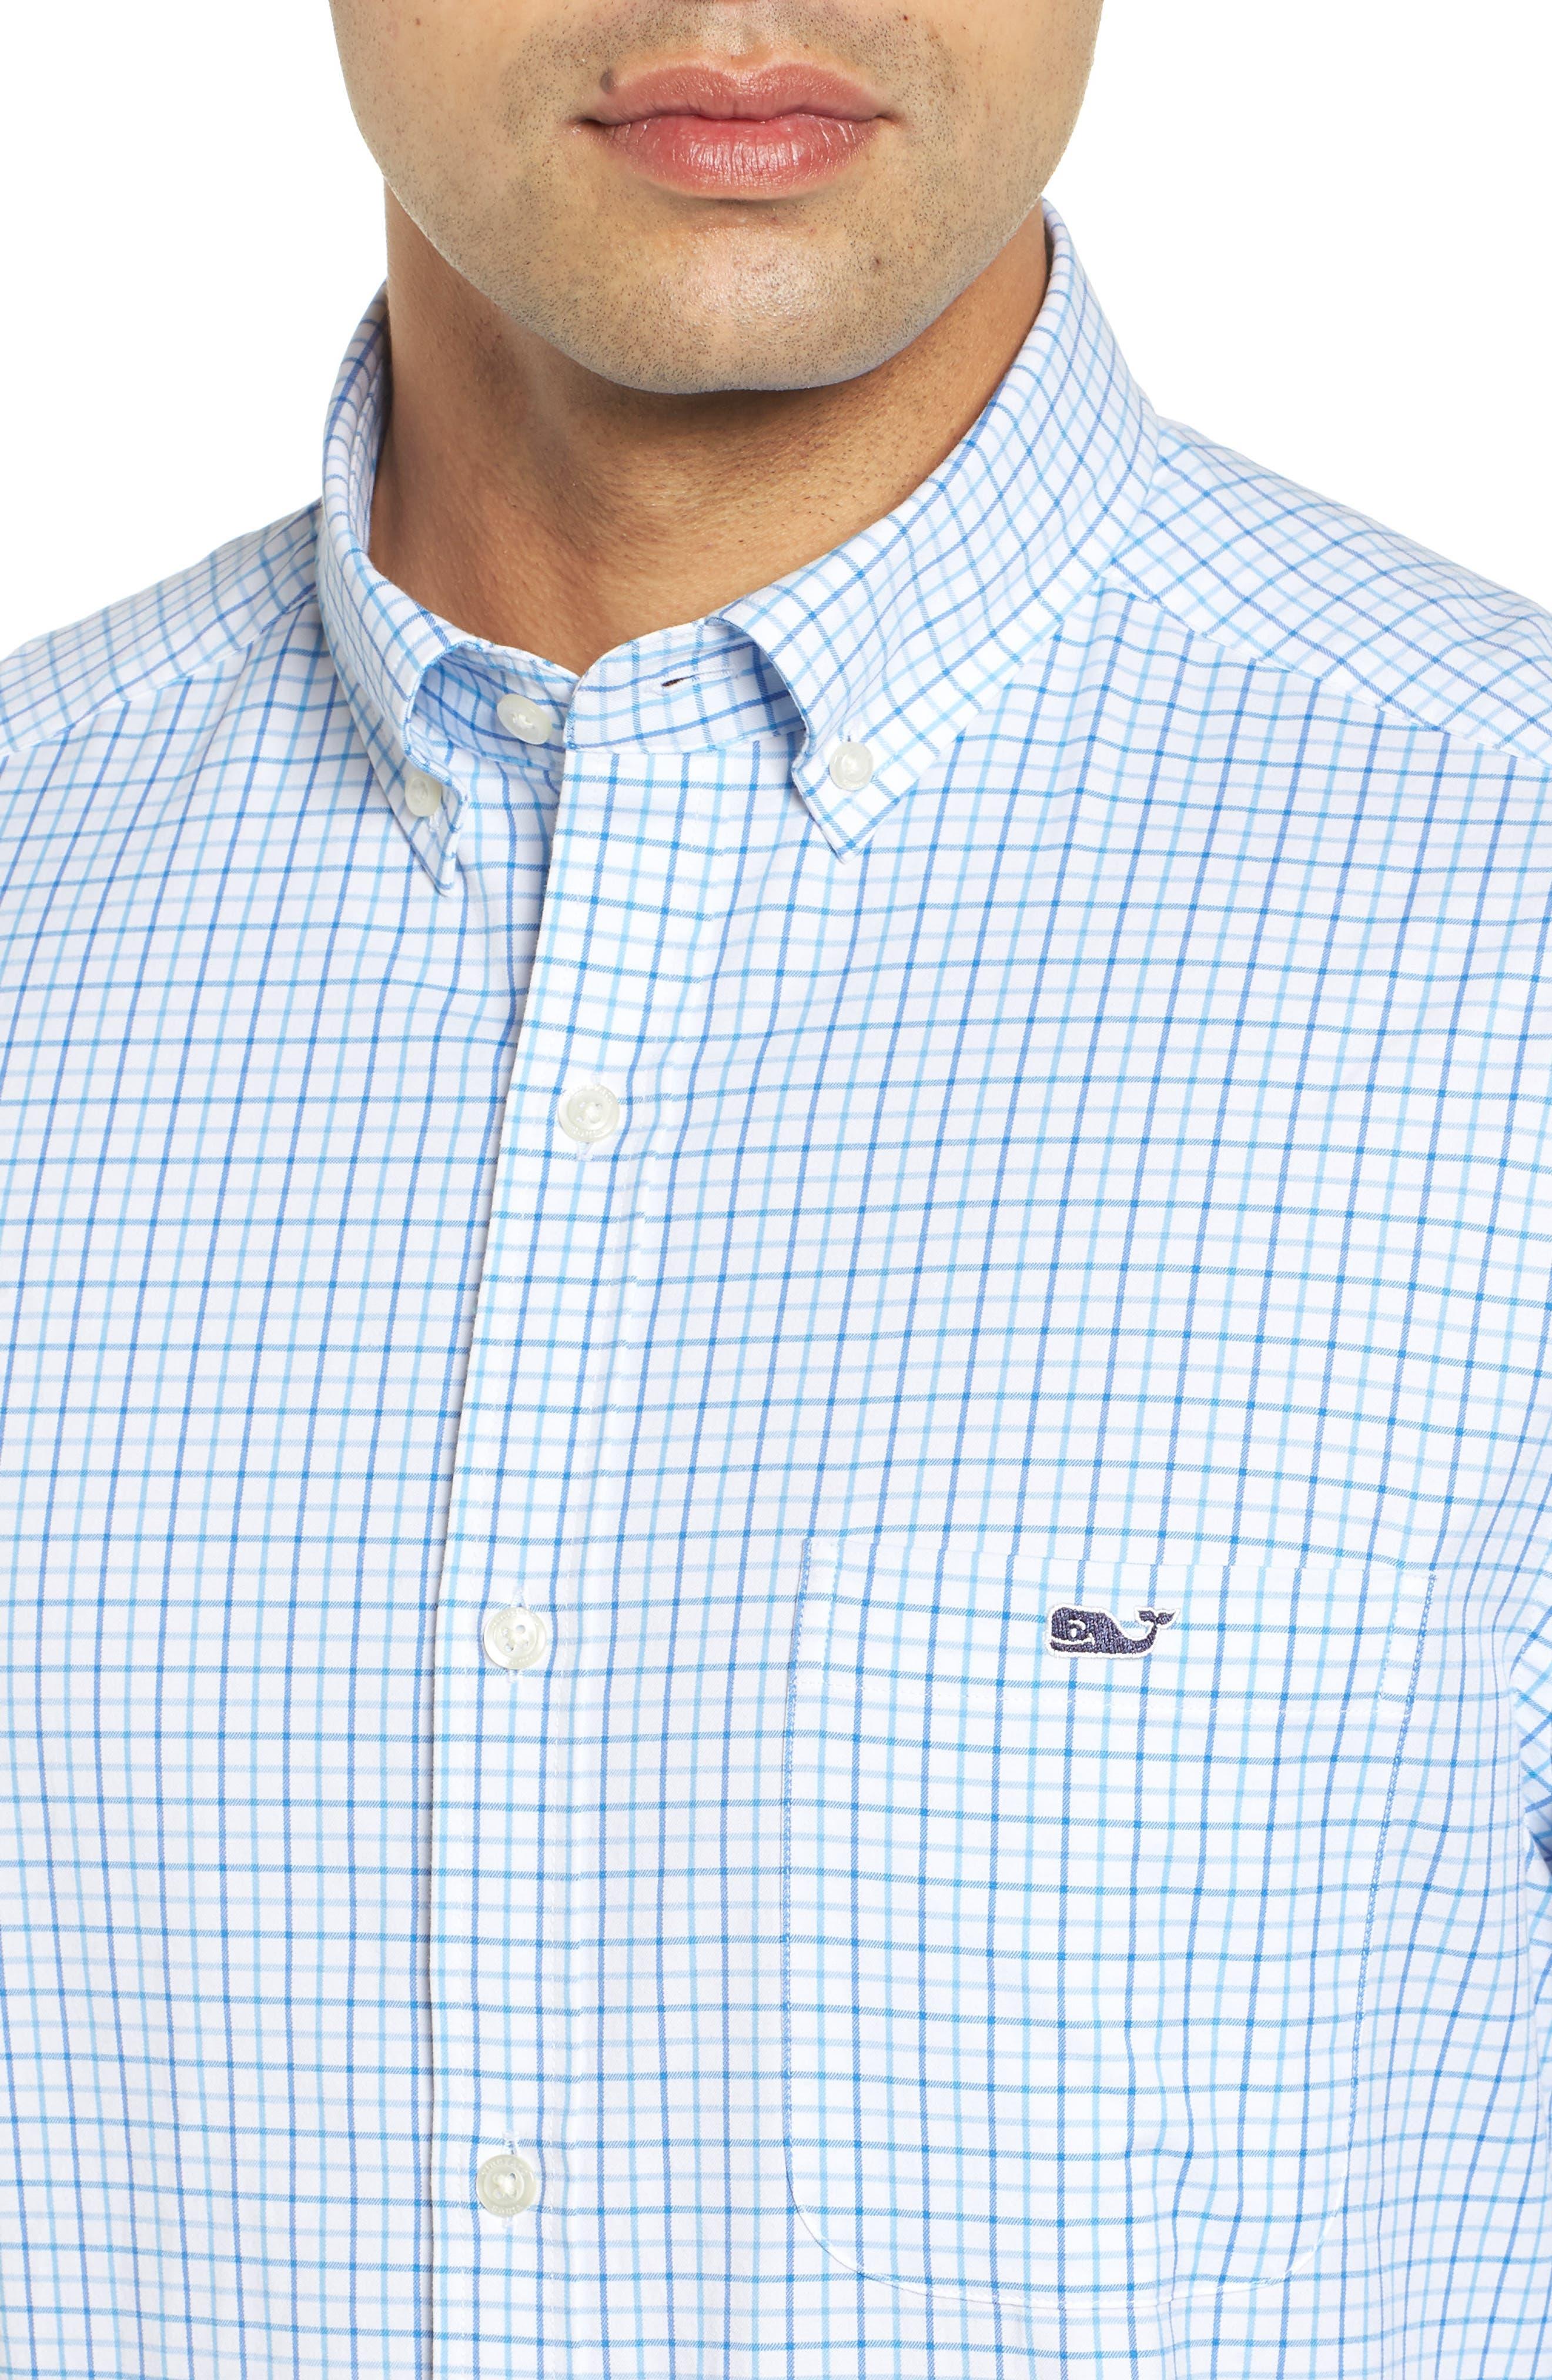 Pepperbush Regular Fit Plaid Sport Shirt,                             Alternate thumbnail 2, color,                             427